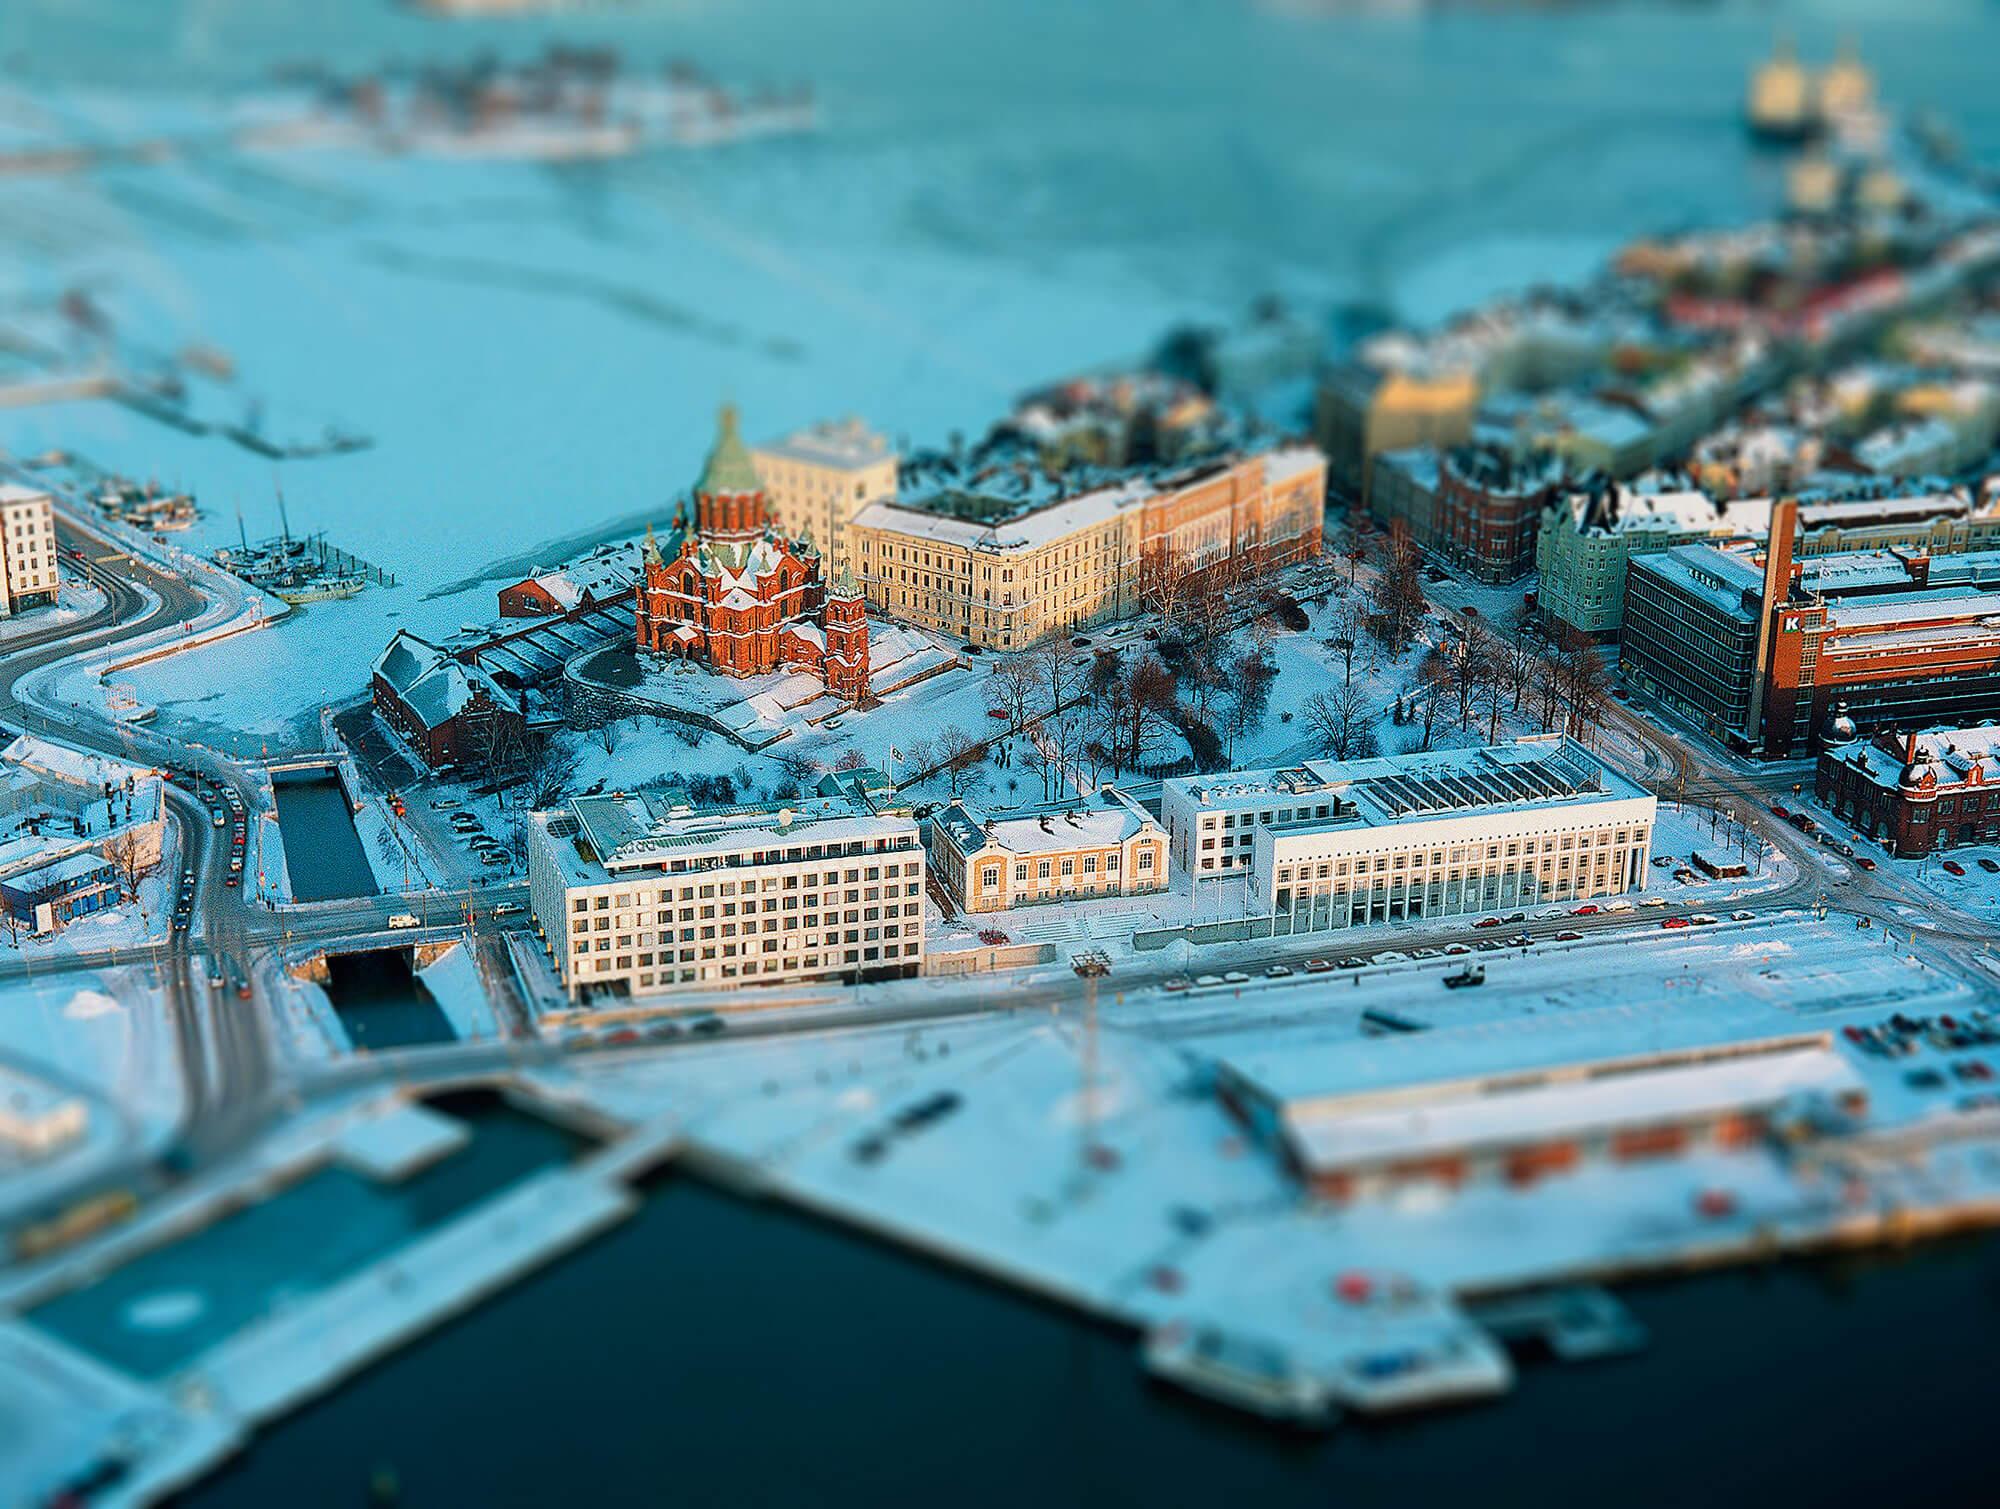 Helsingin Kaupungin Hoivakodit